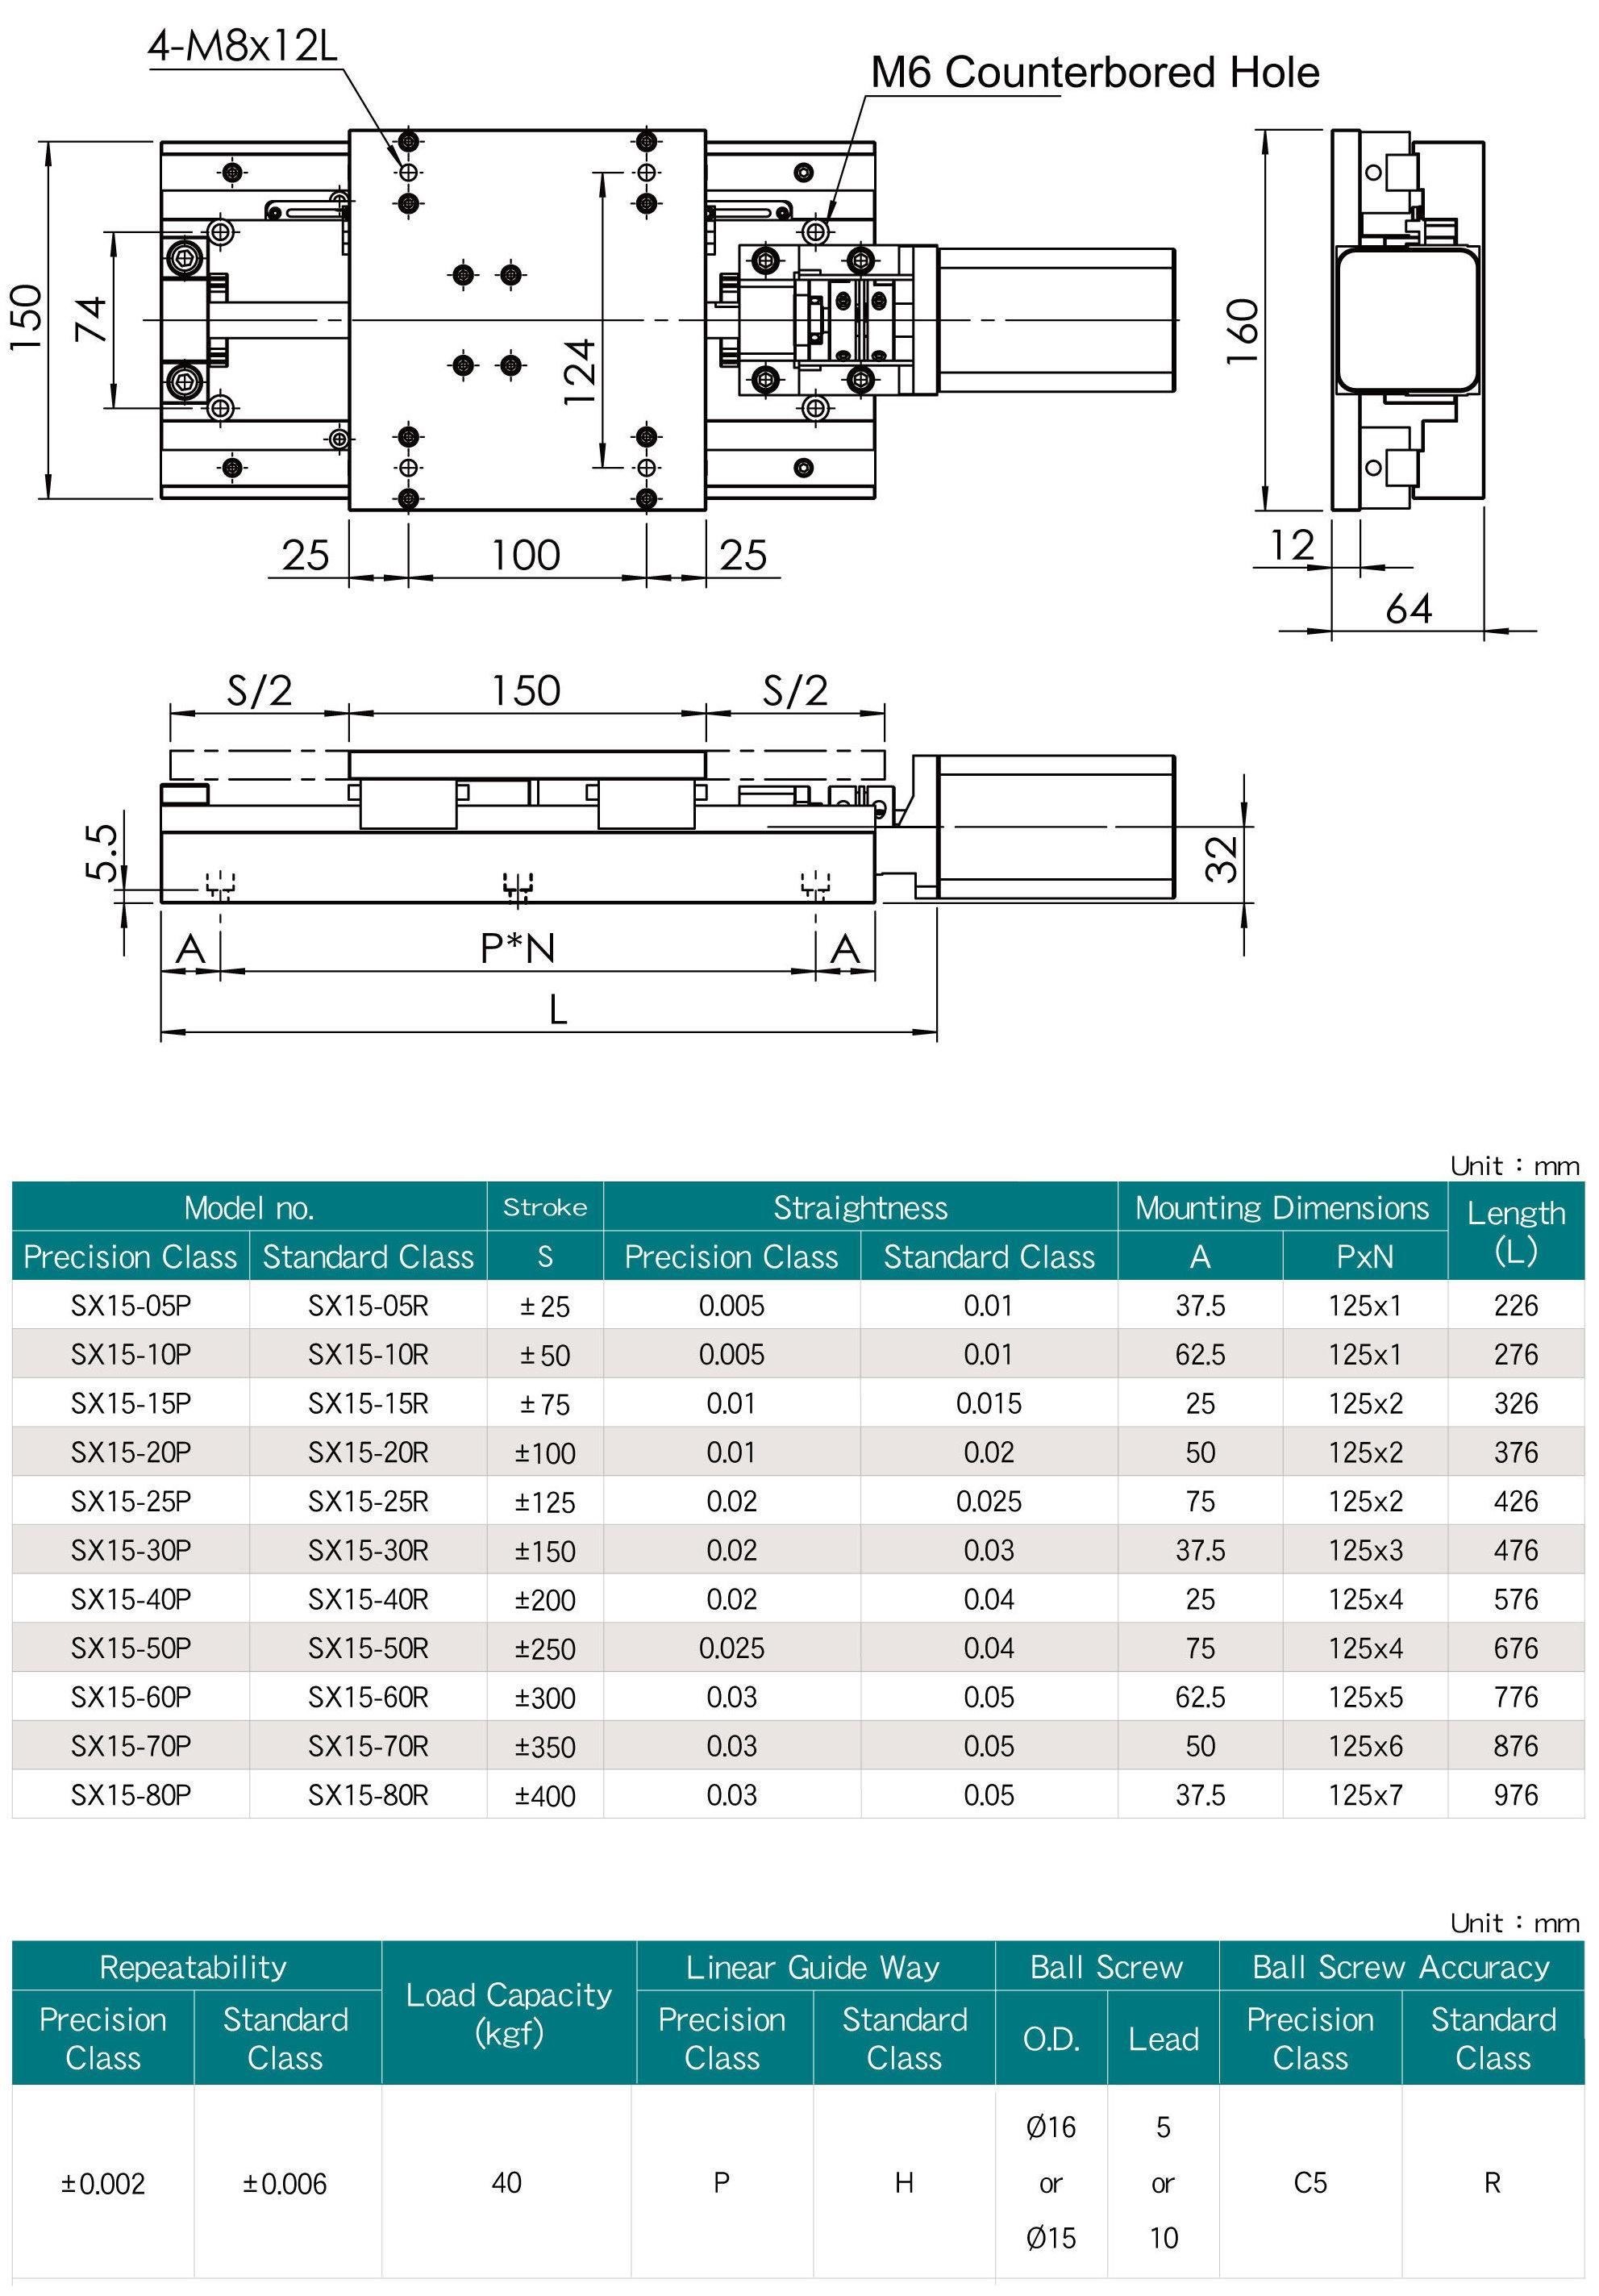 SYK- SONYUNG Industry Co ,Ltd - Ballscrew Support Unit,Nut Bracket